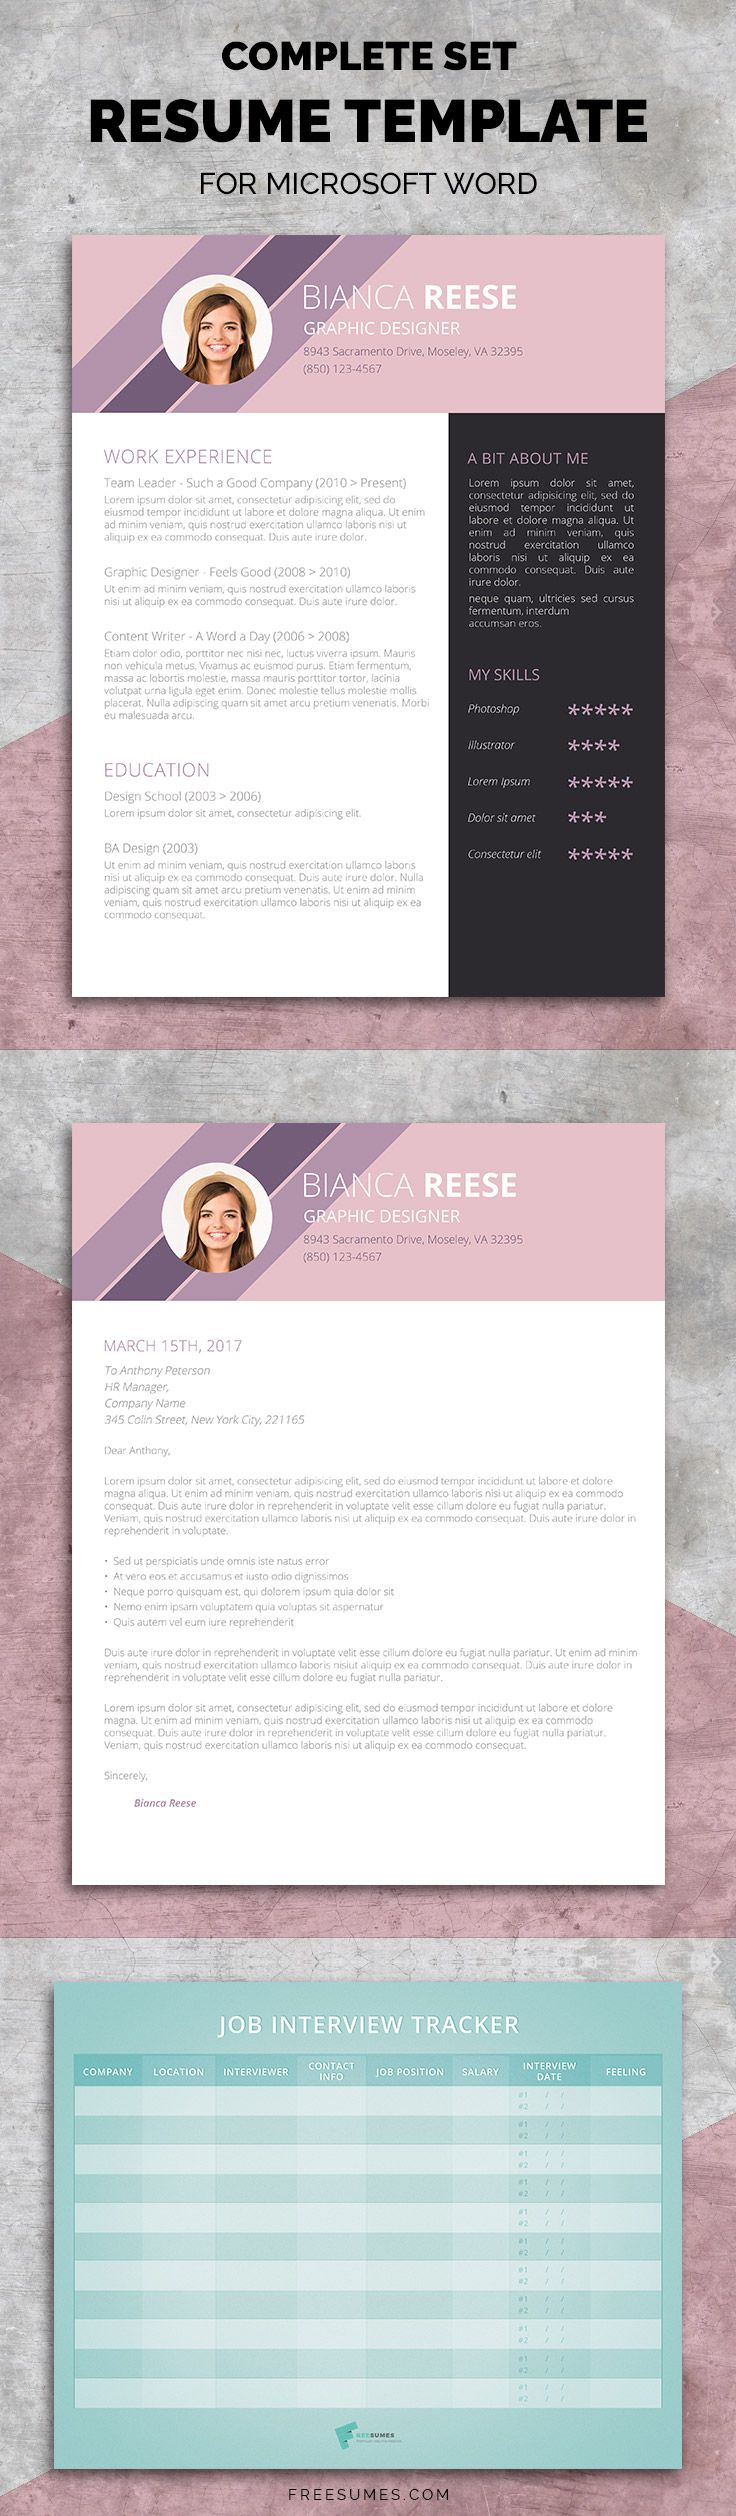 Resume Template Set for Microsoft Word - Dressed To Impress! The Ingenious Original Premium Resume Package #resume #package #Word